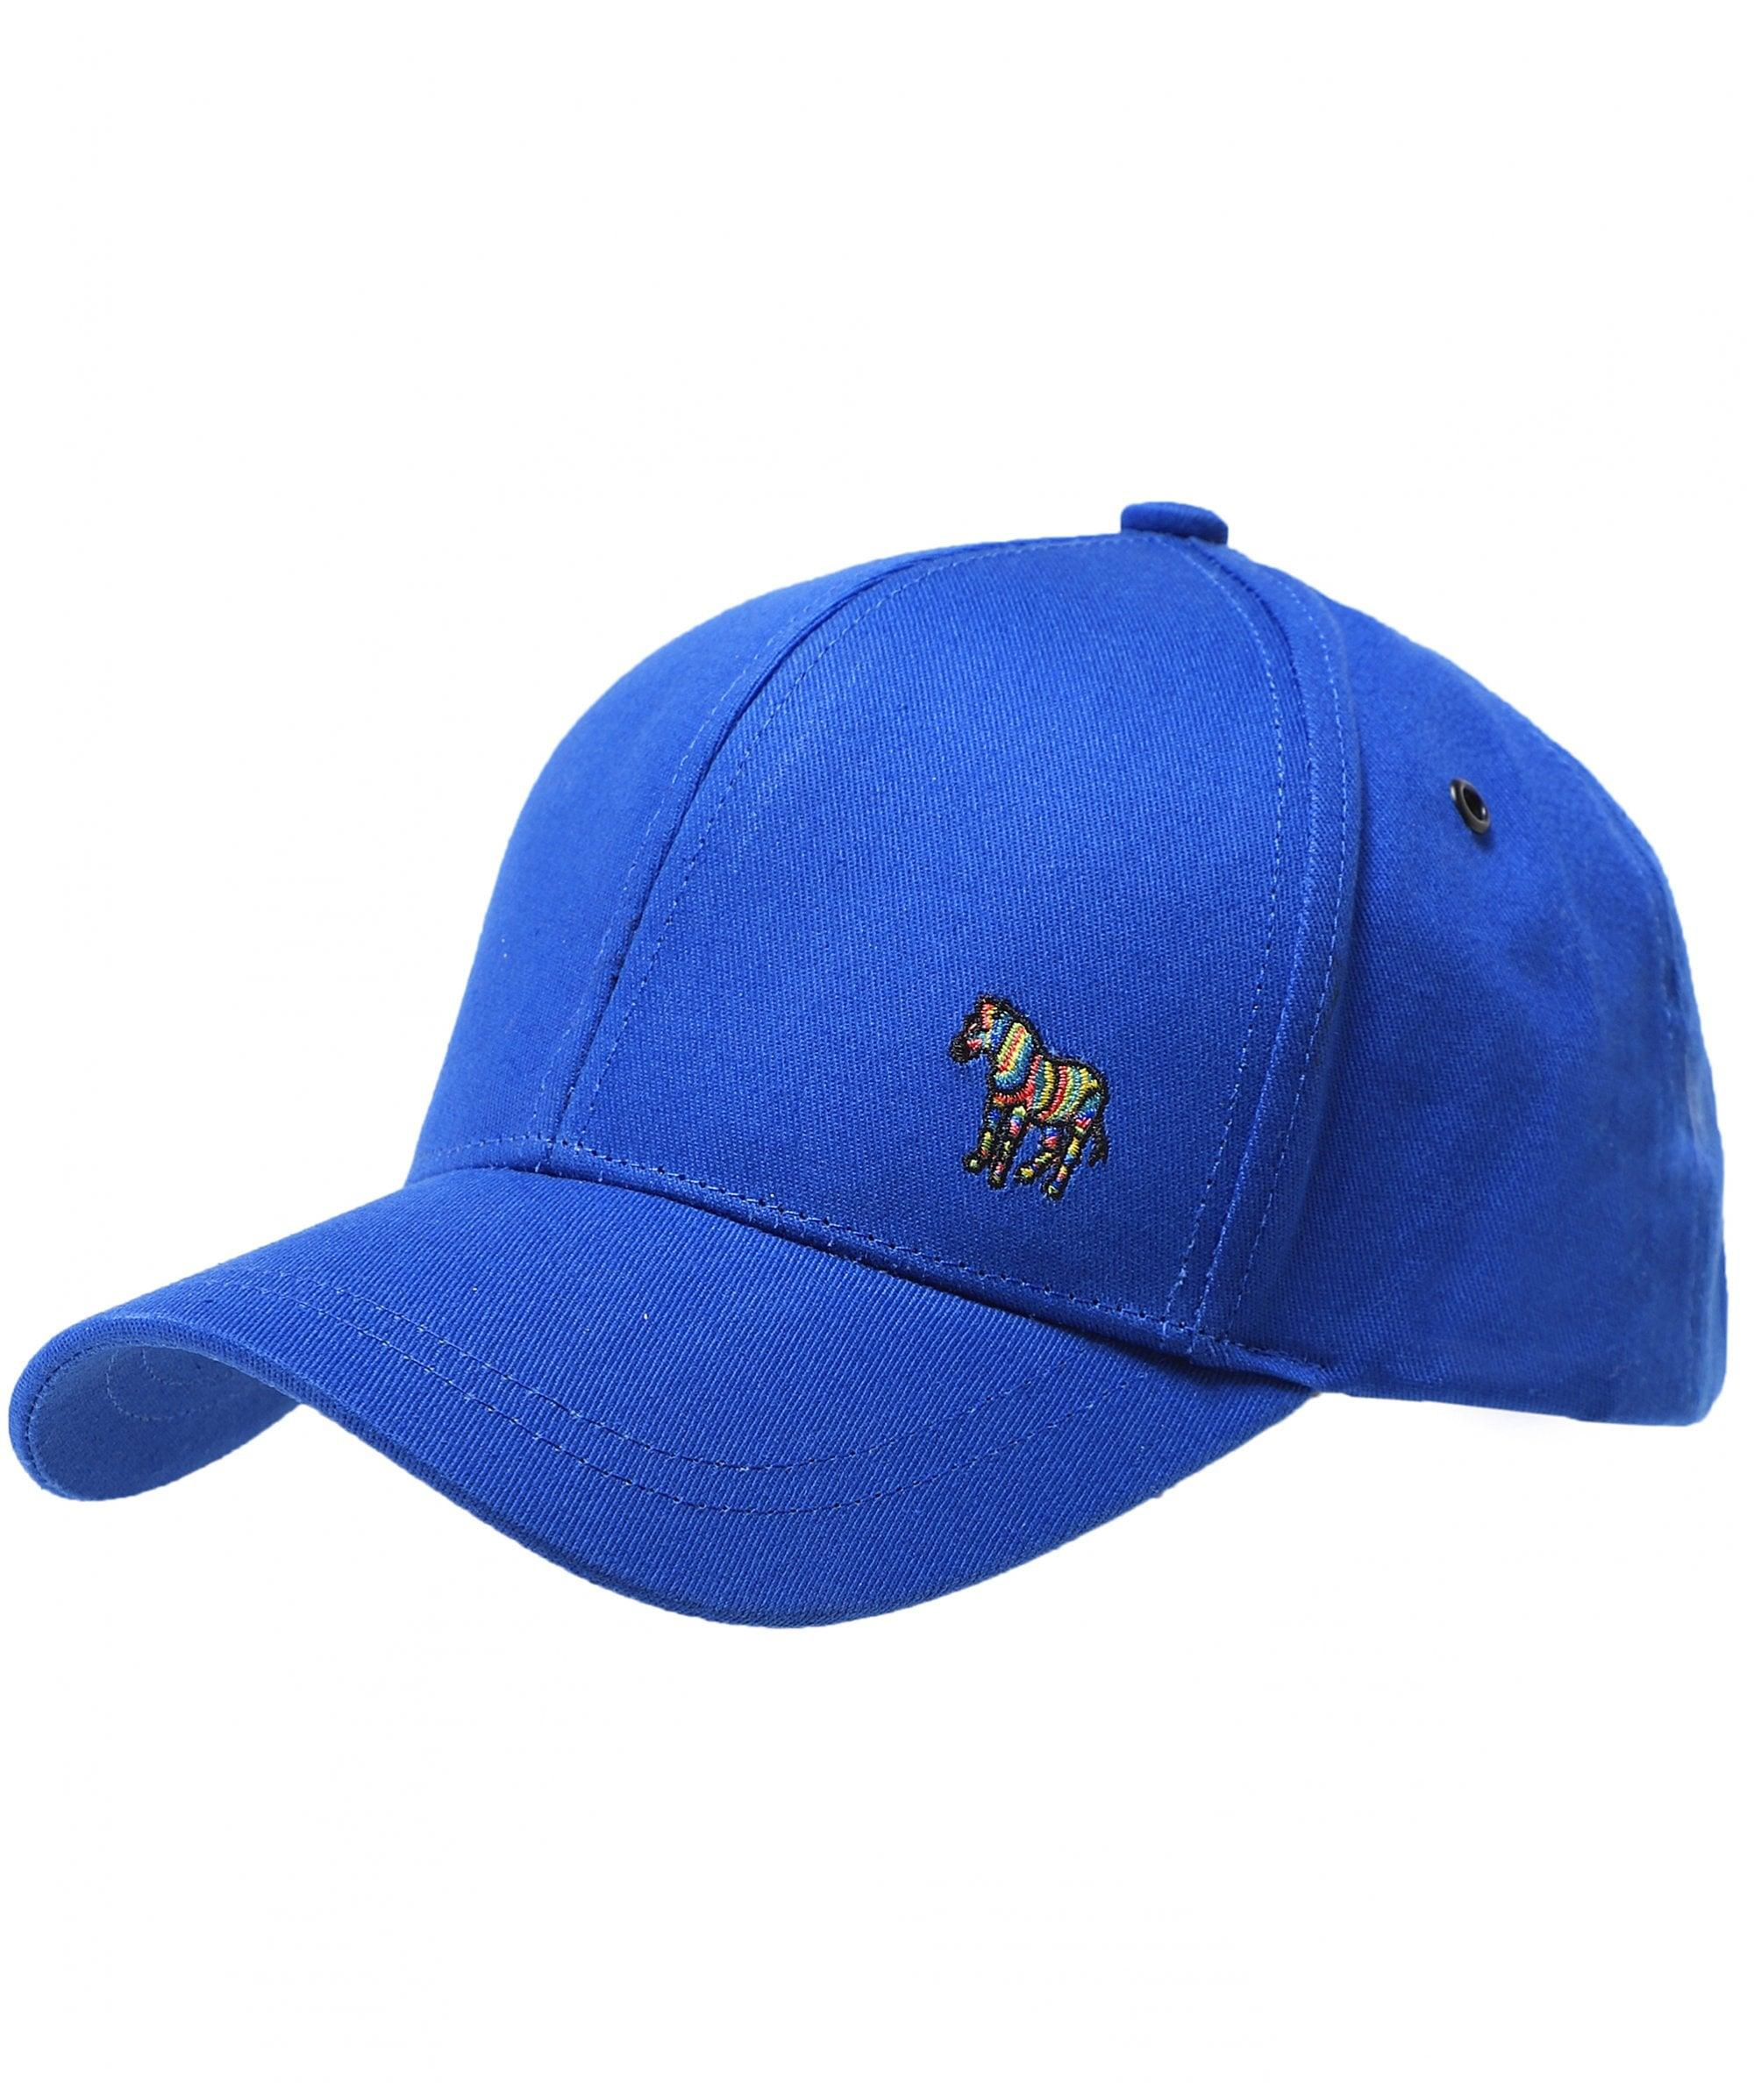 c36f7e81b21 Lyst - Ps By Paul Smith Cotton Zebra Logo Baseball Cap in Blue for Men